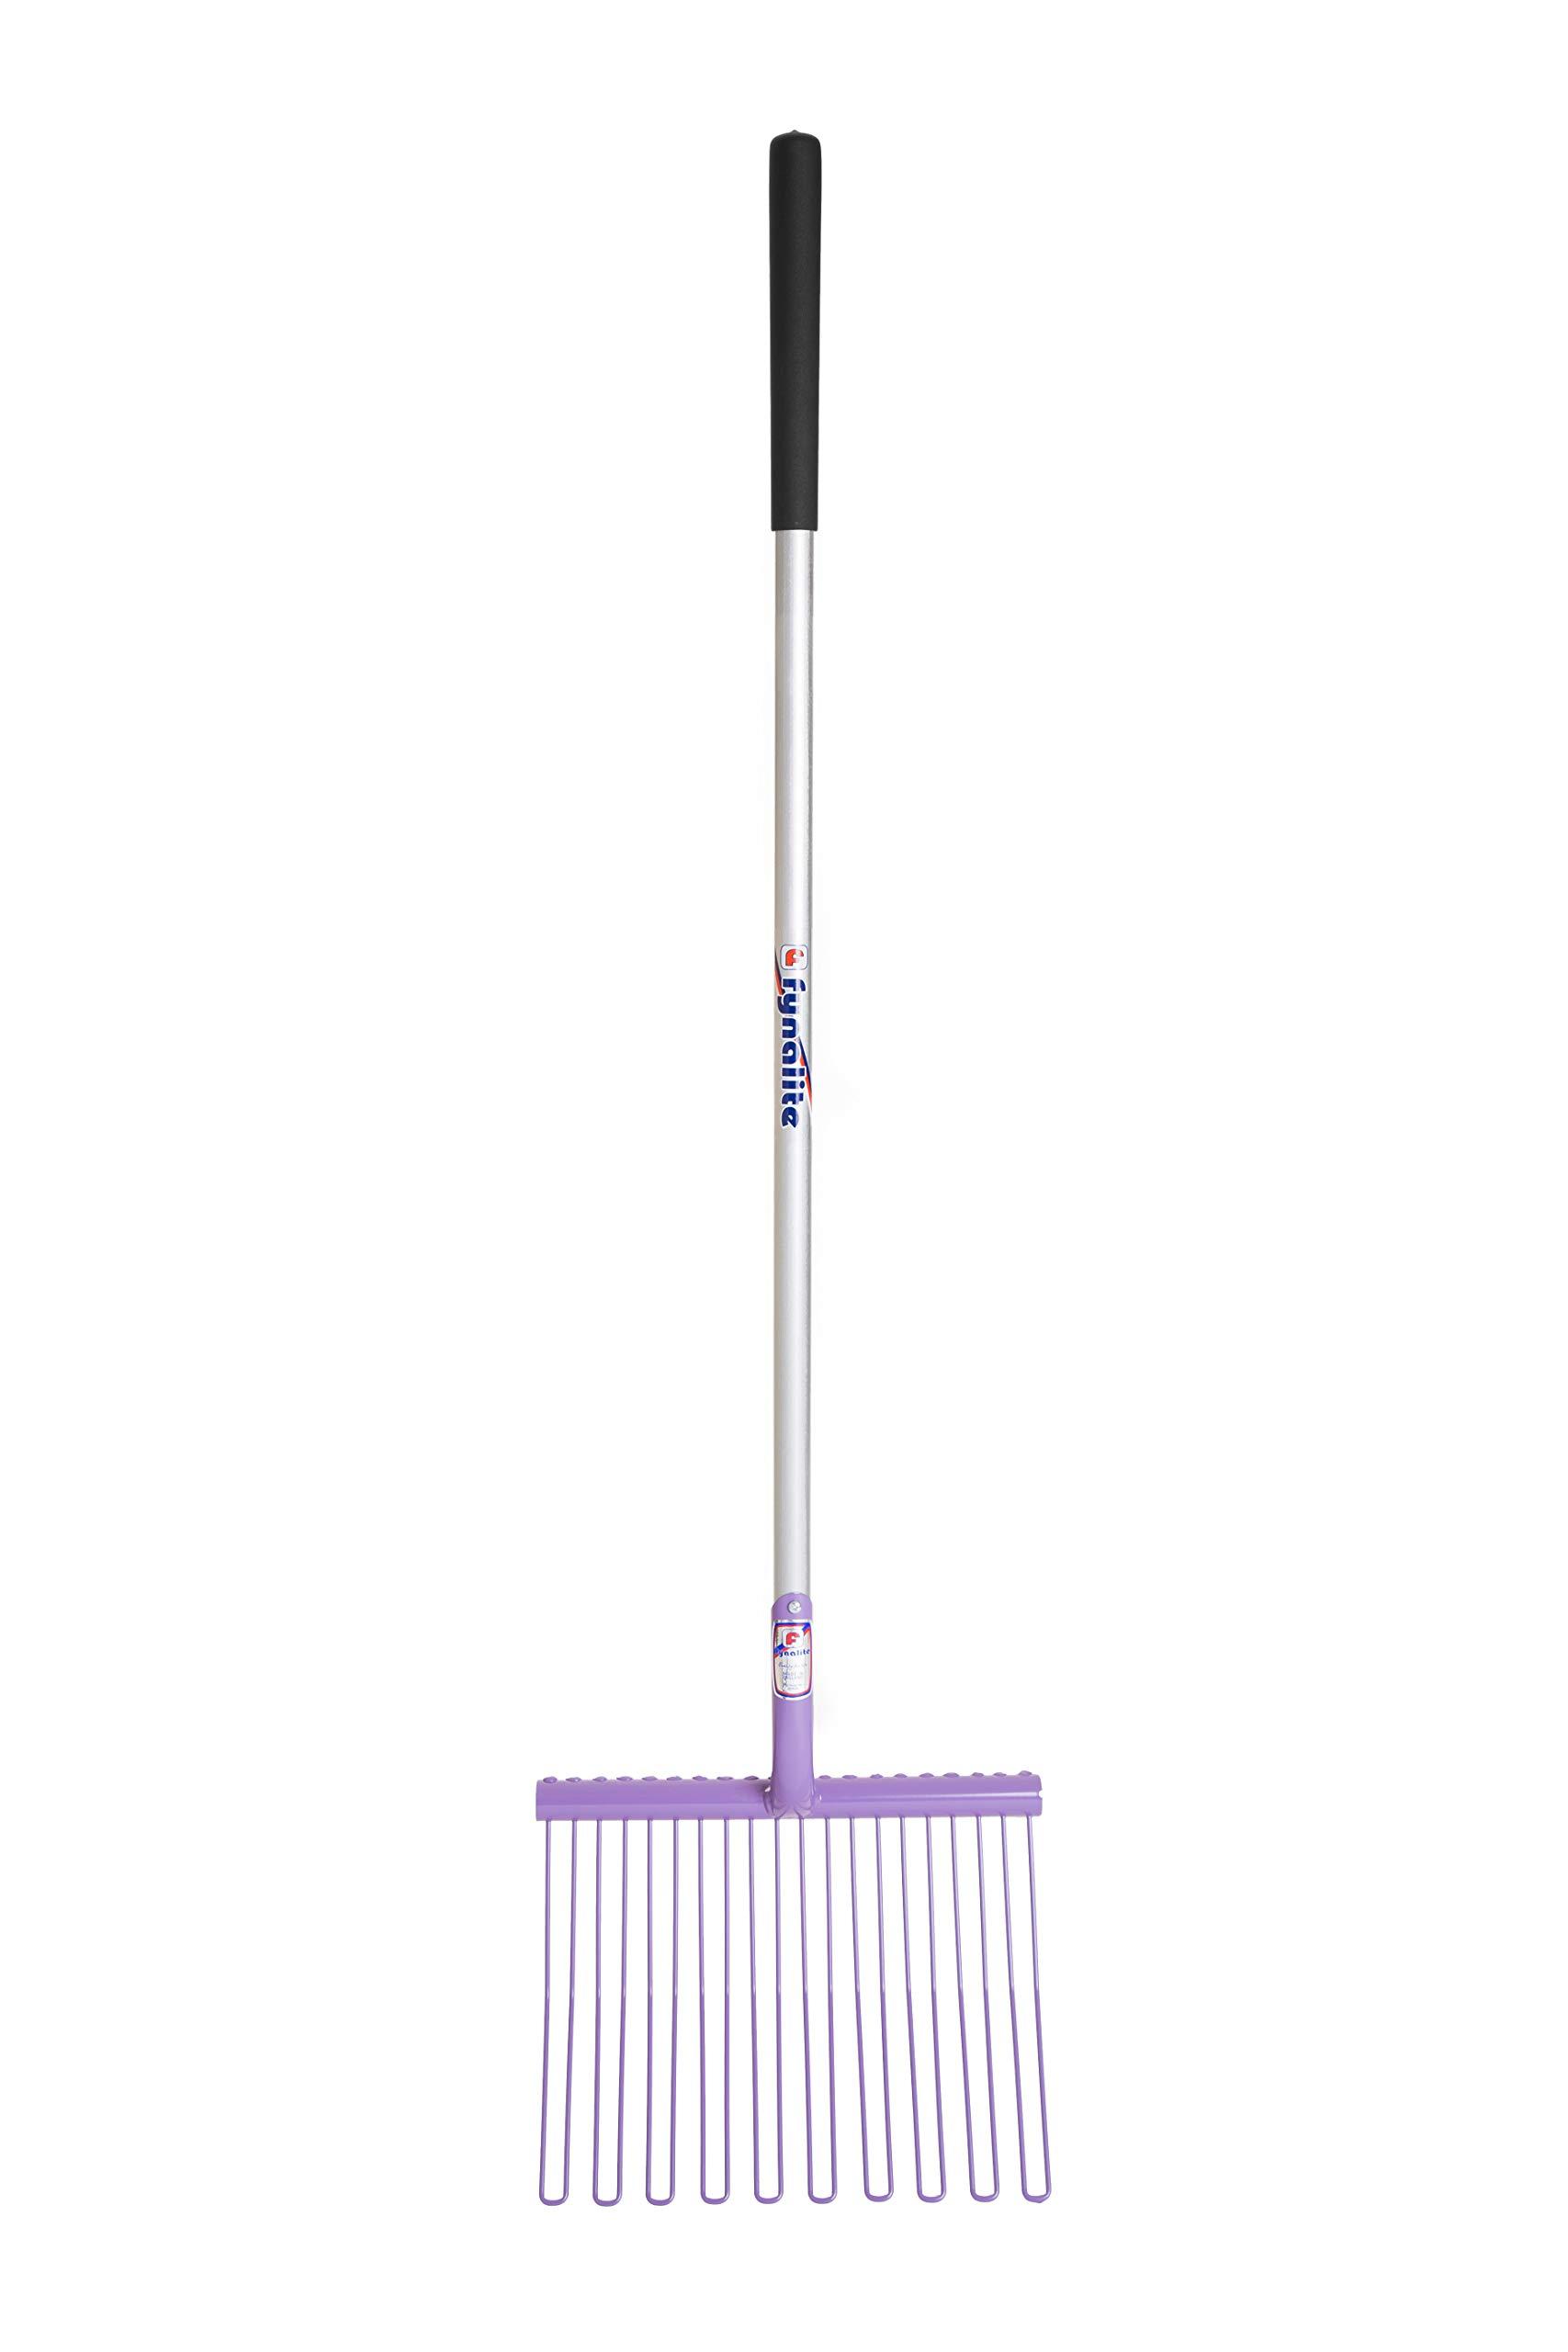 Fyna-Lite Rubber Matting Fork (3.9ft) (Long Wood Handle (RMLPURP)) by Fyna-Lite